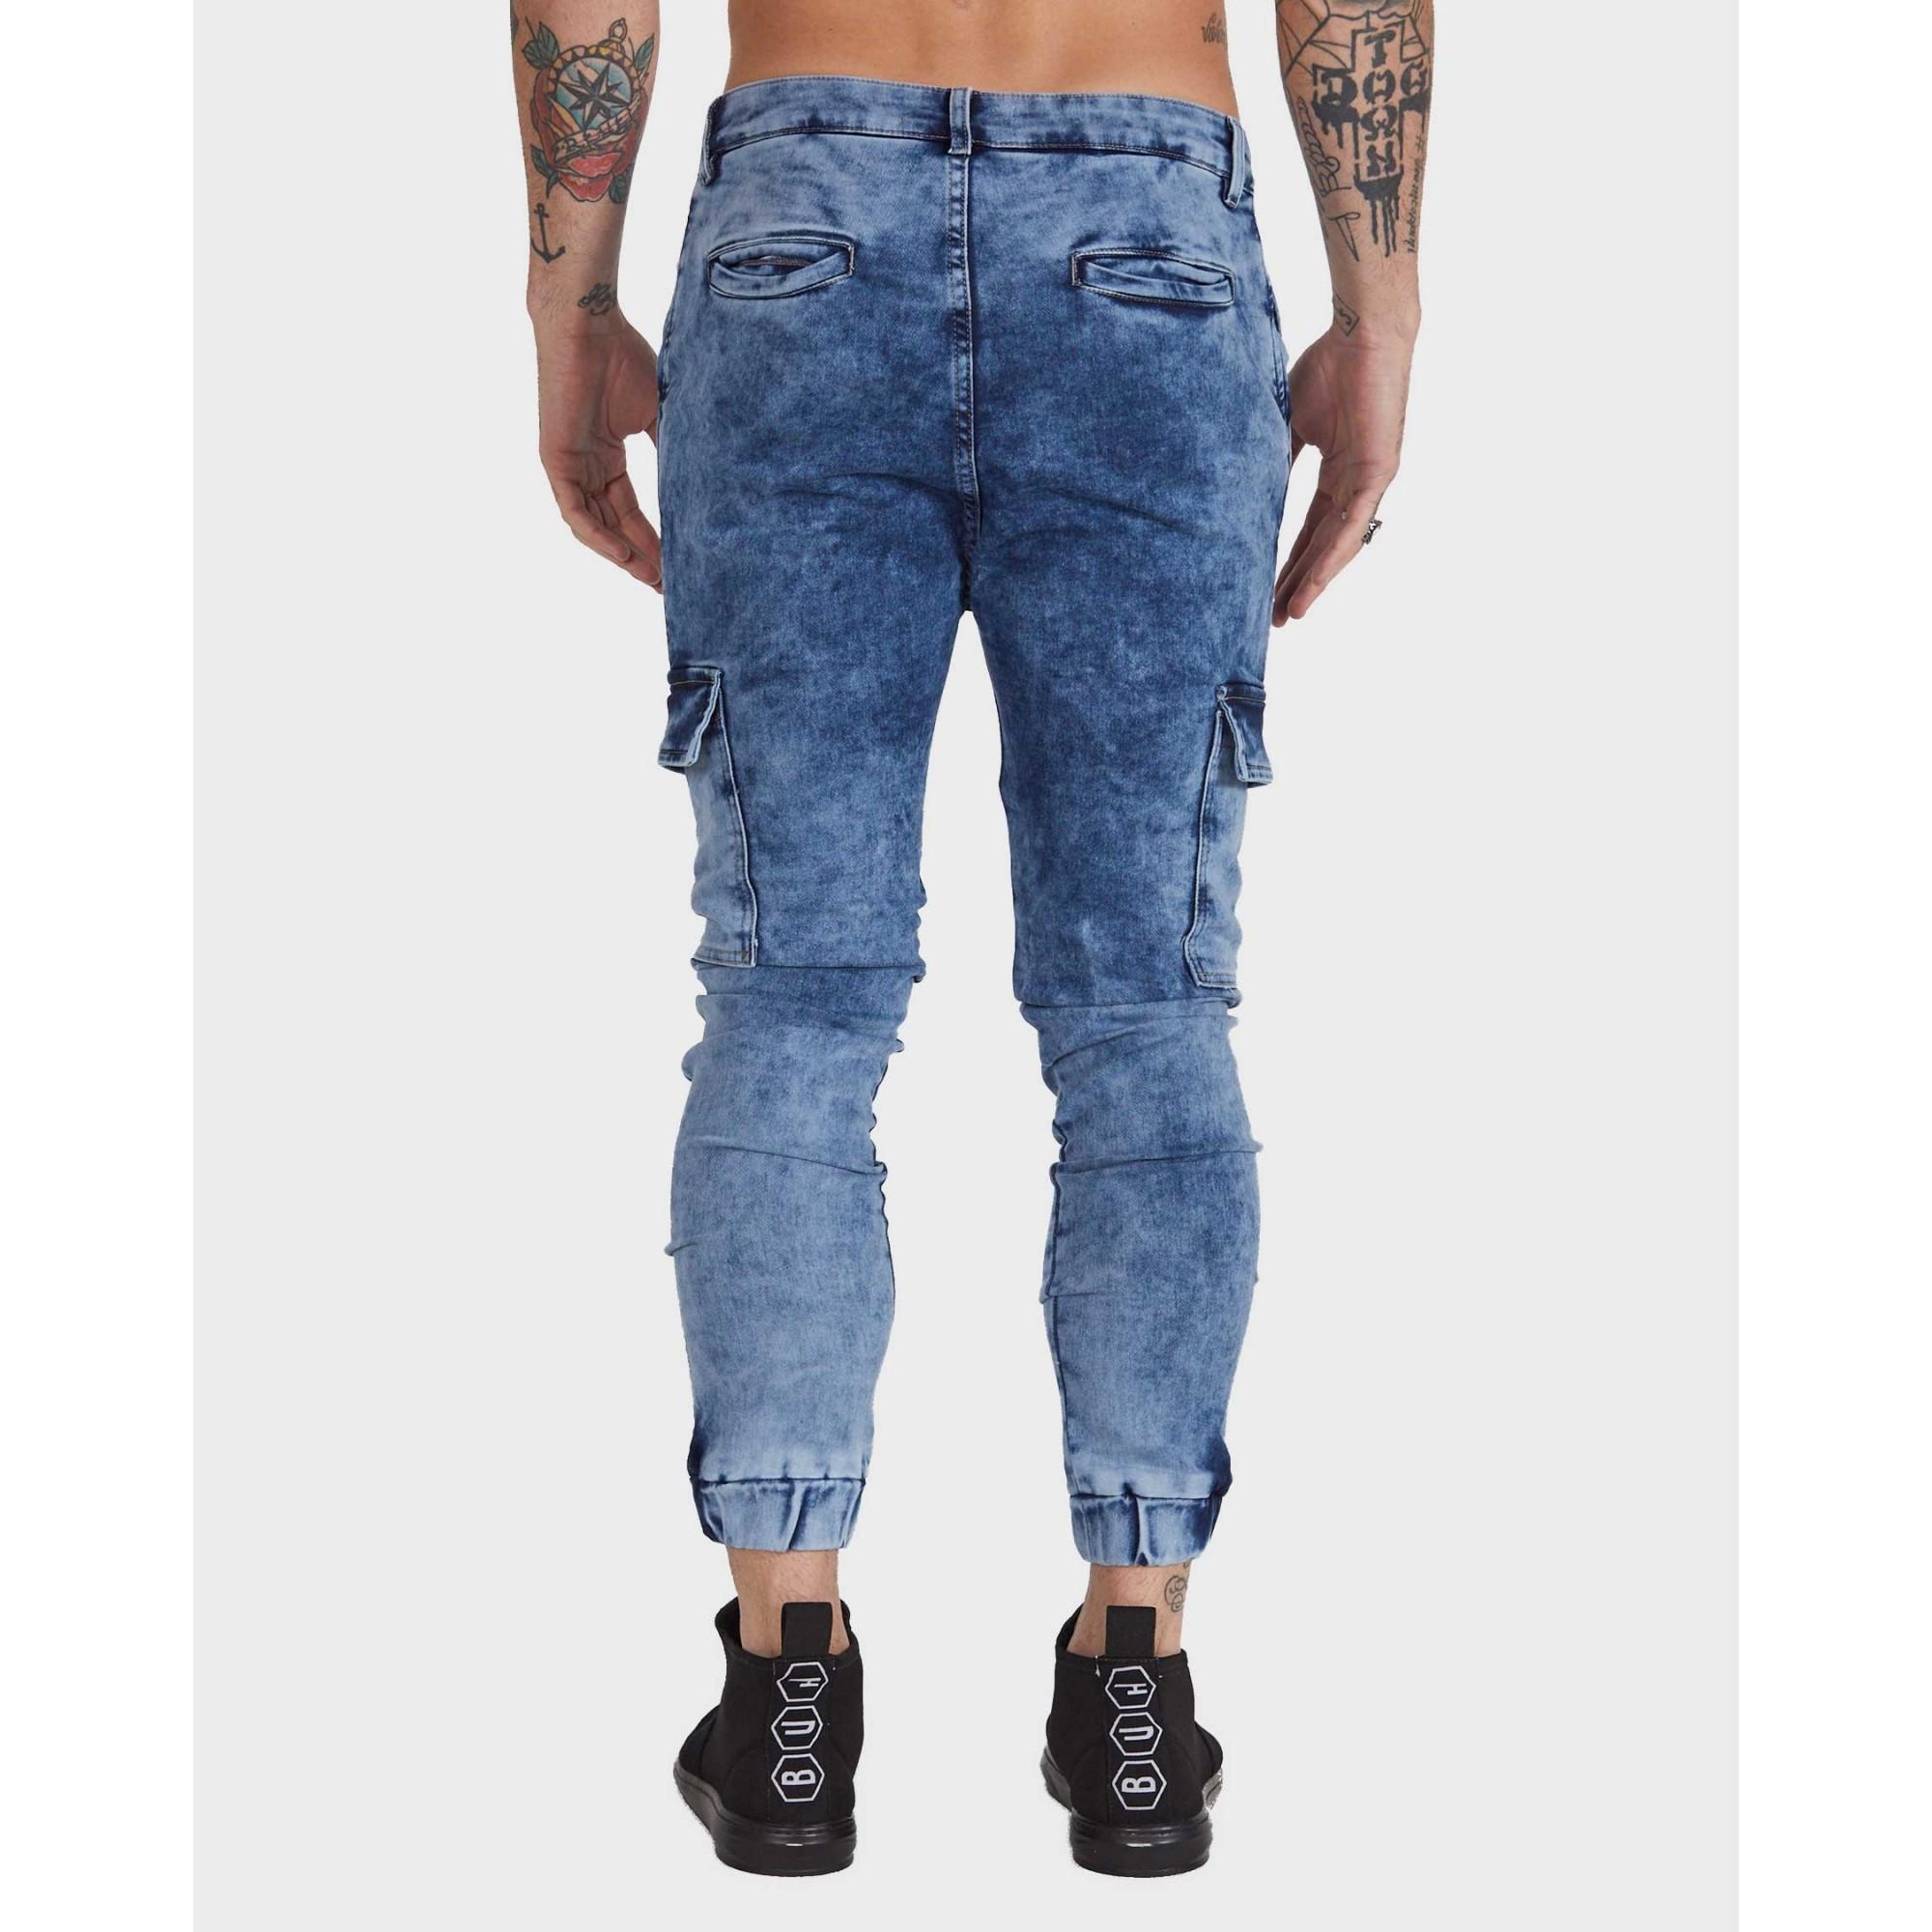 Calça Buh Jeans Jogger Cargo Blue